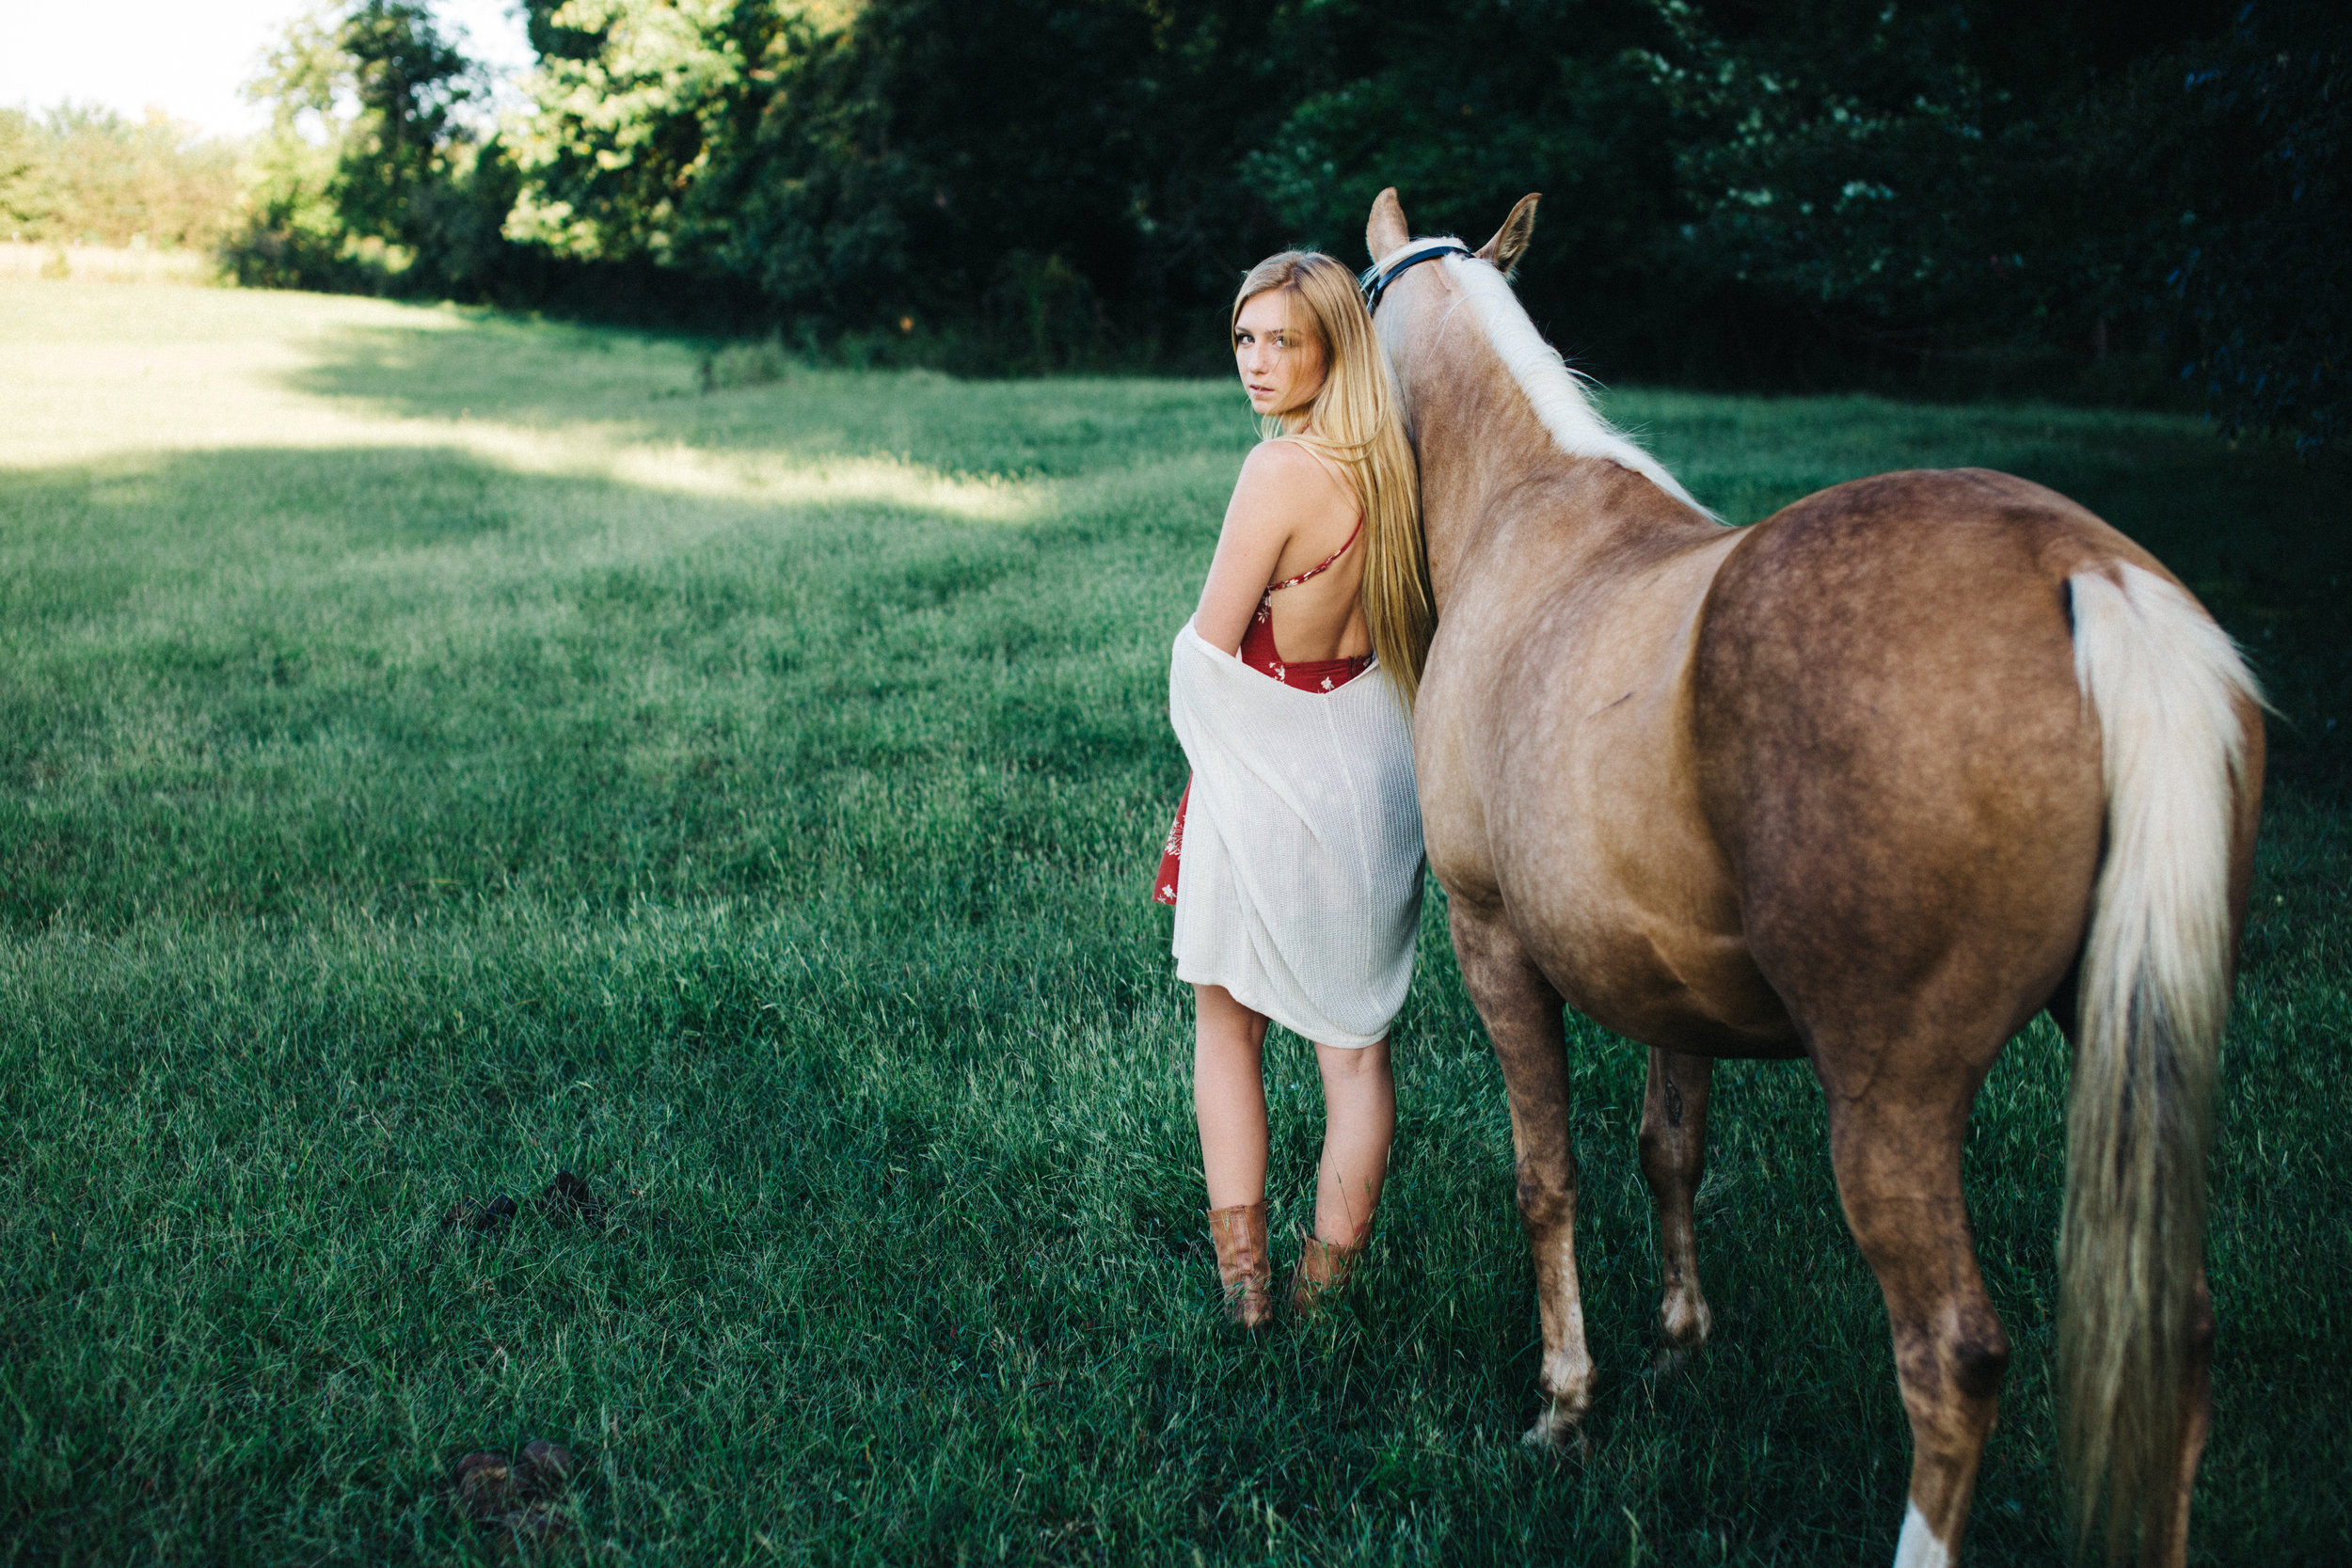 annapolis-maryland-senior-portrait-session-photographer-boho-horse-inspo-emma-jean-photography-3-photo.jpg